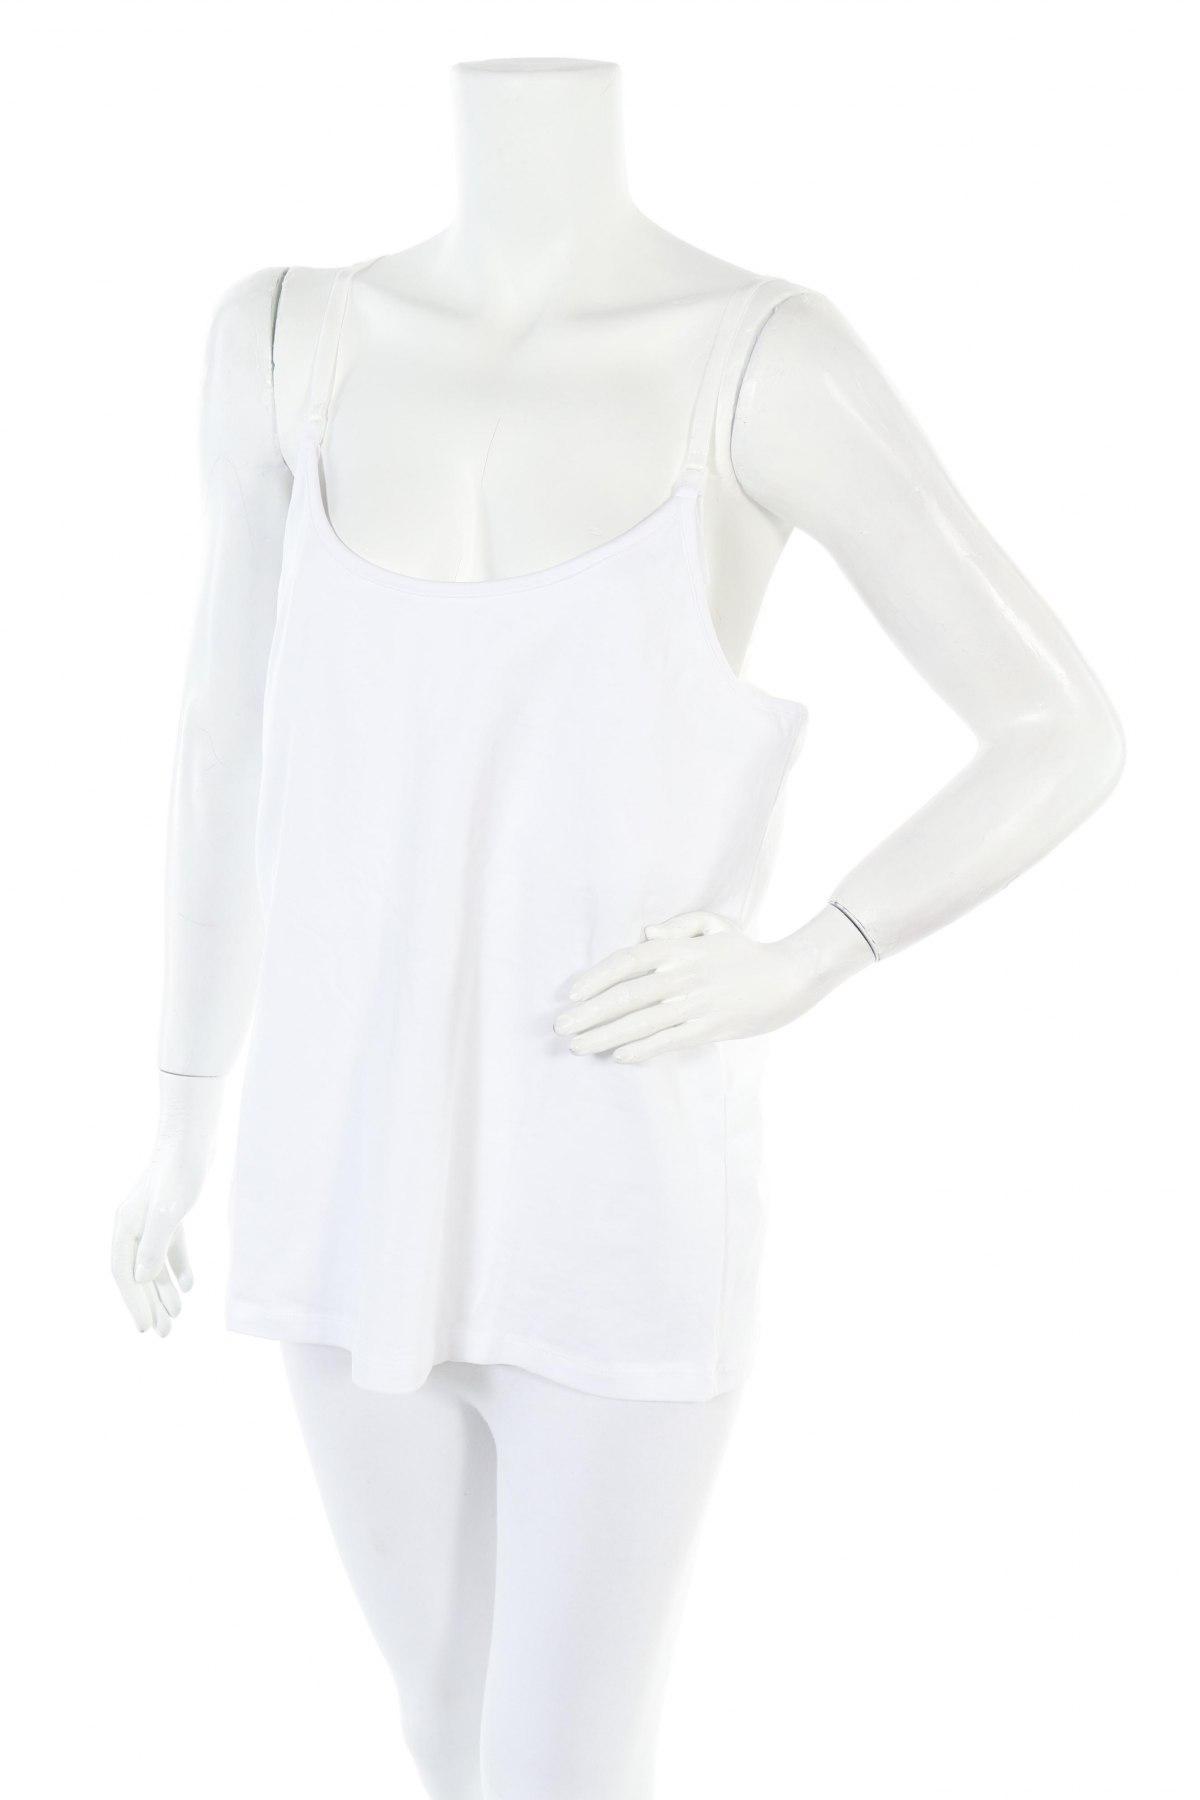 Дамско бельо Neun Monate, Размер XL, Цвят Бял, 95% памук, 5% еластан, Цена 15,96лв.